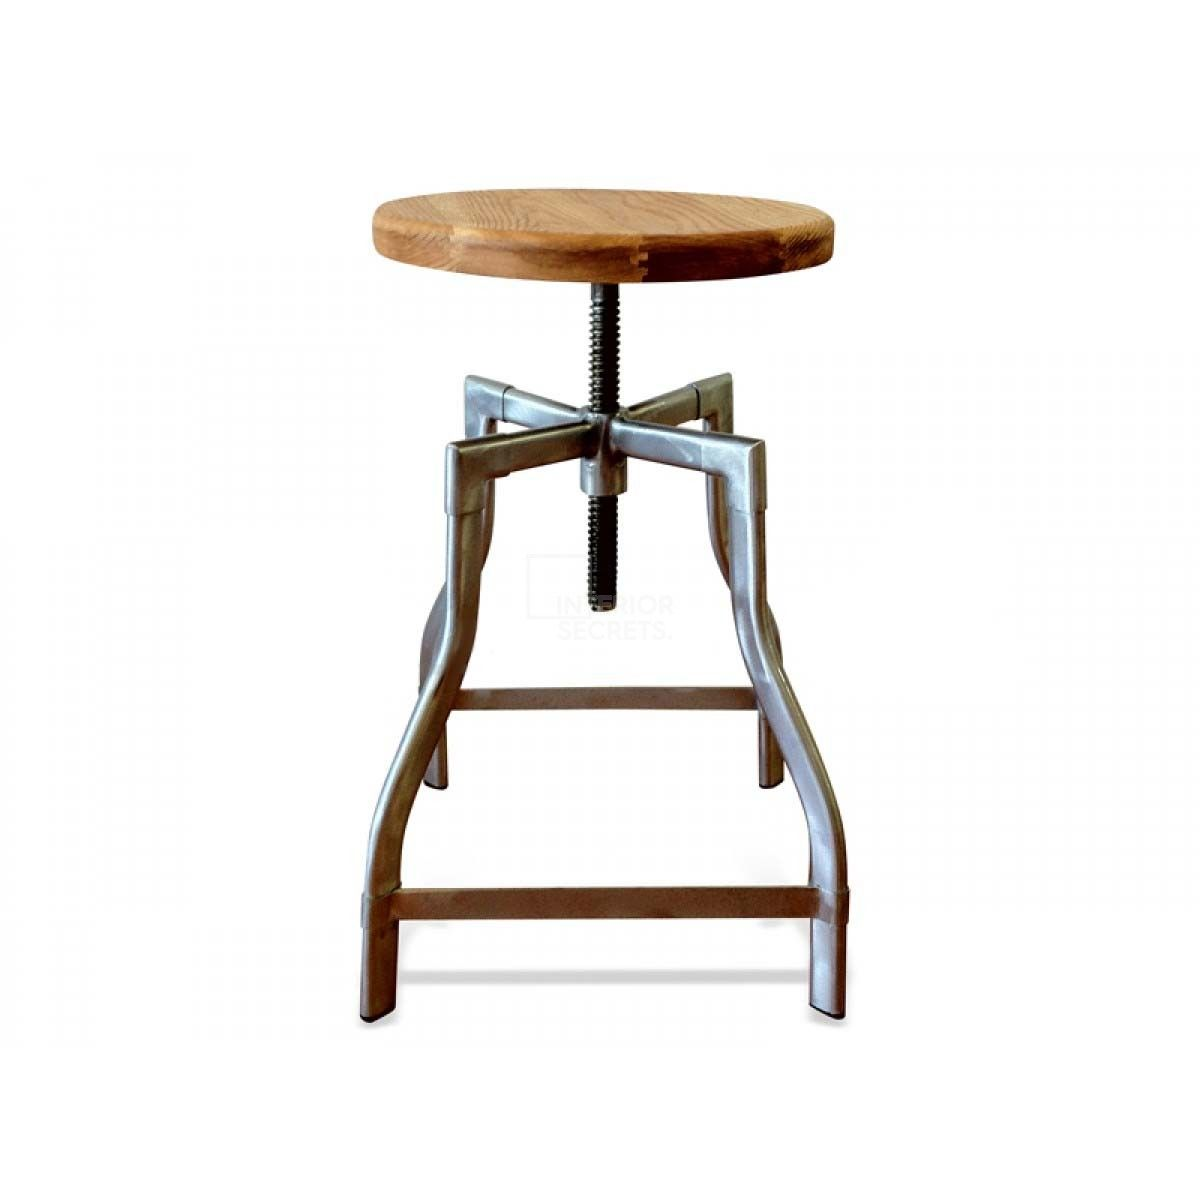 stools sydney furniture industrial adjustable stool turner replica timber seat